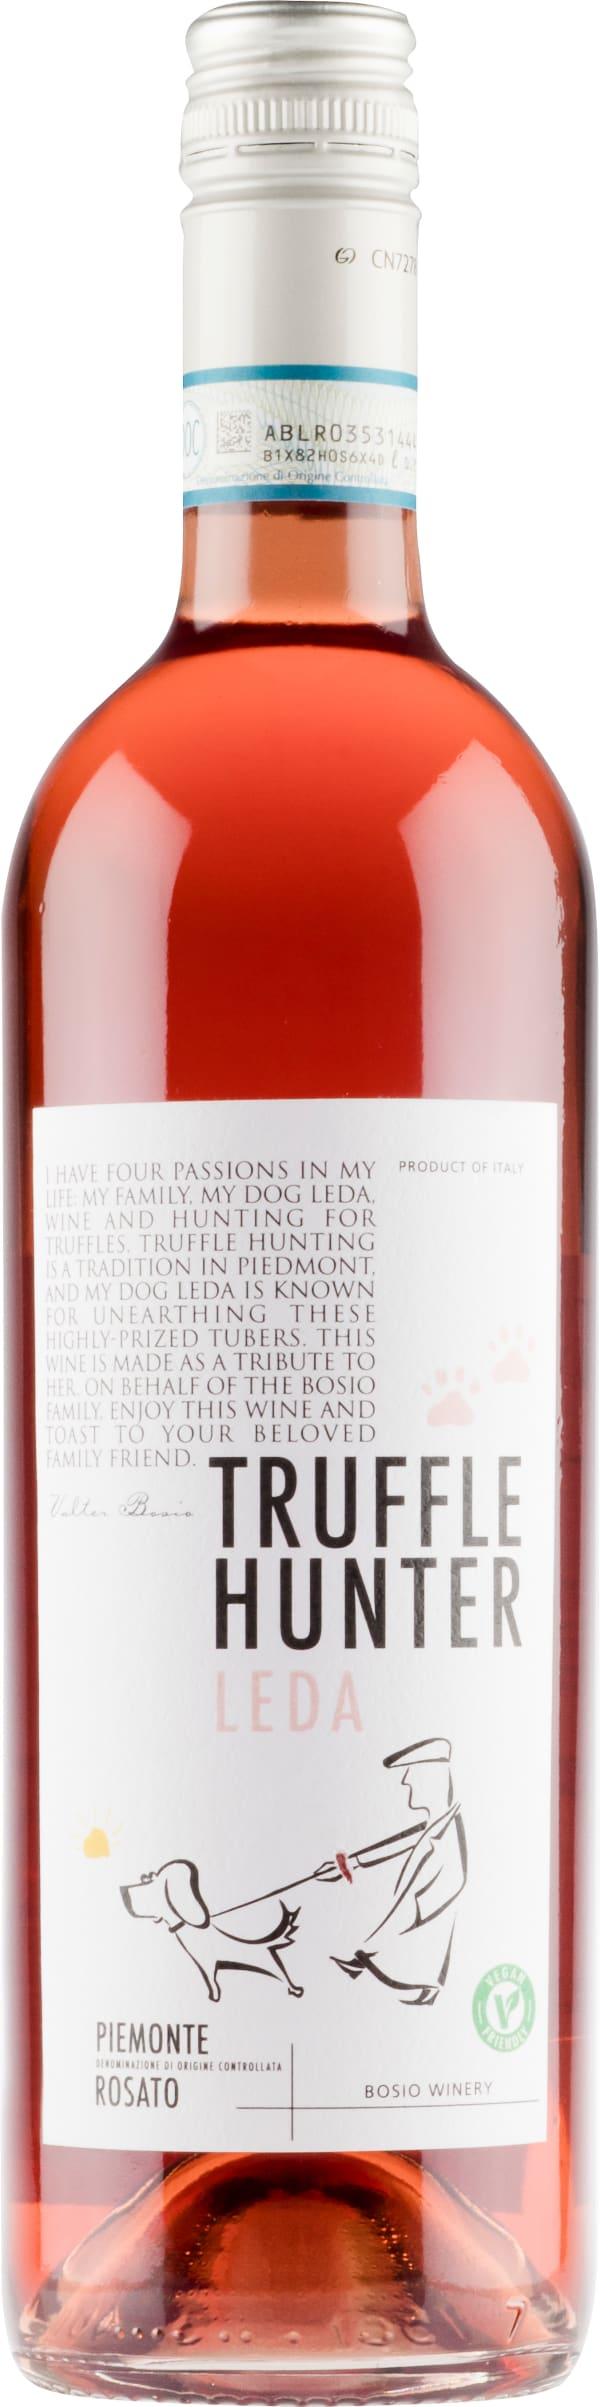 Truffle Hunter Piemonte Rosé 2019